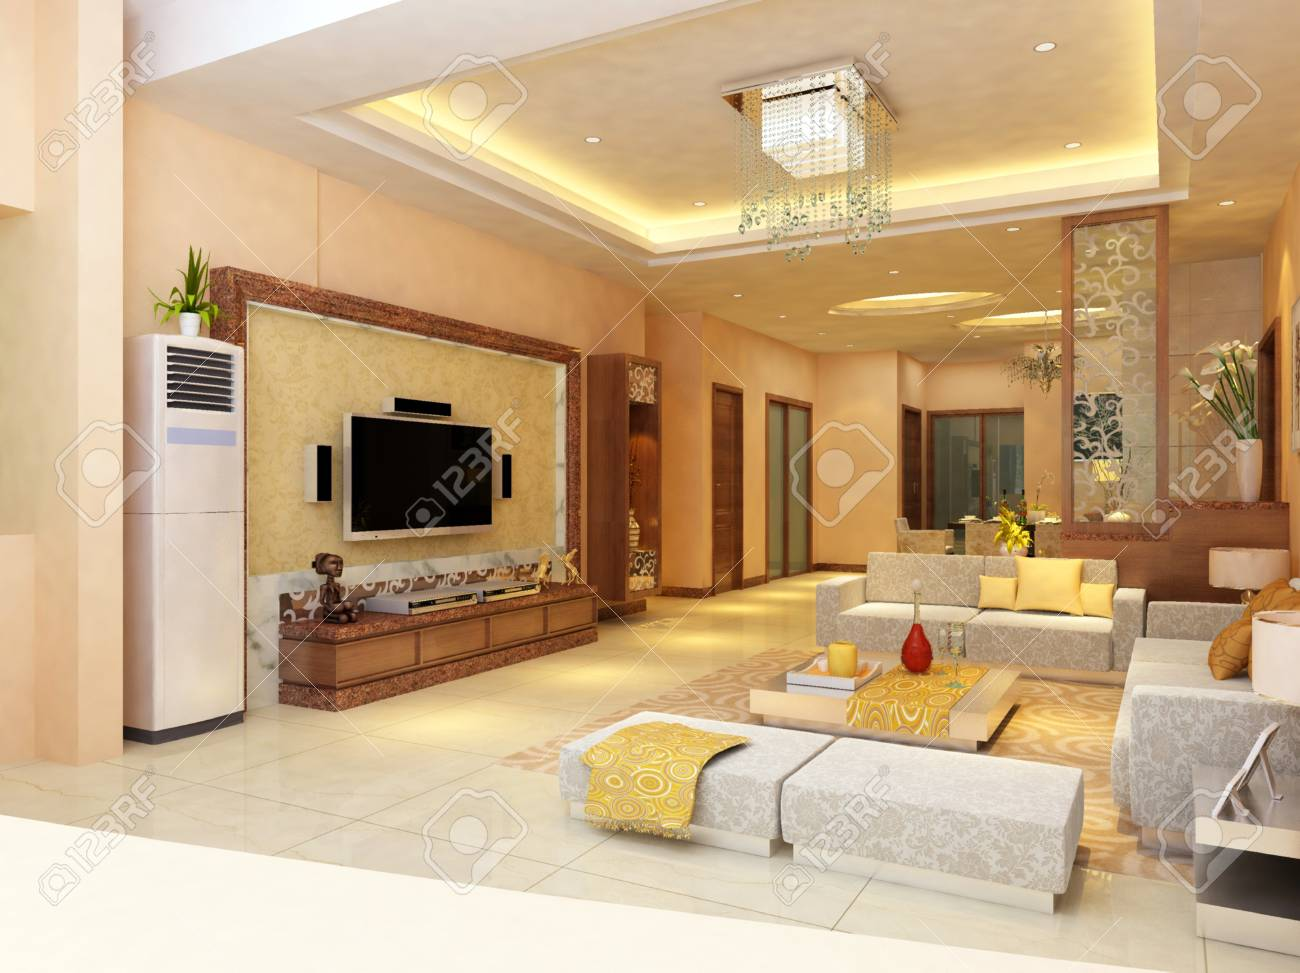 Interior fashionable living-room rendering Stock Photo - 9501458